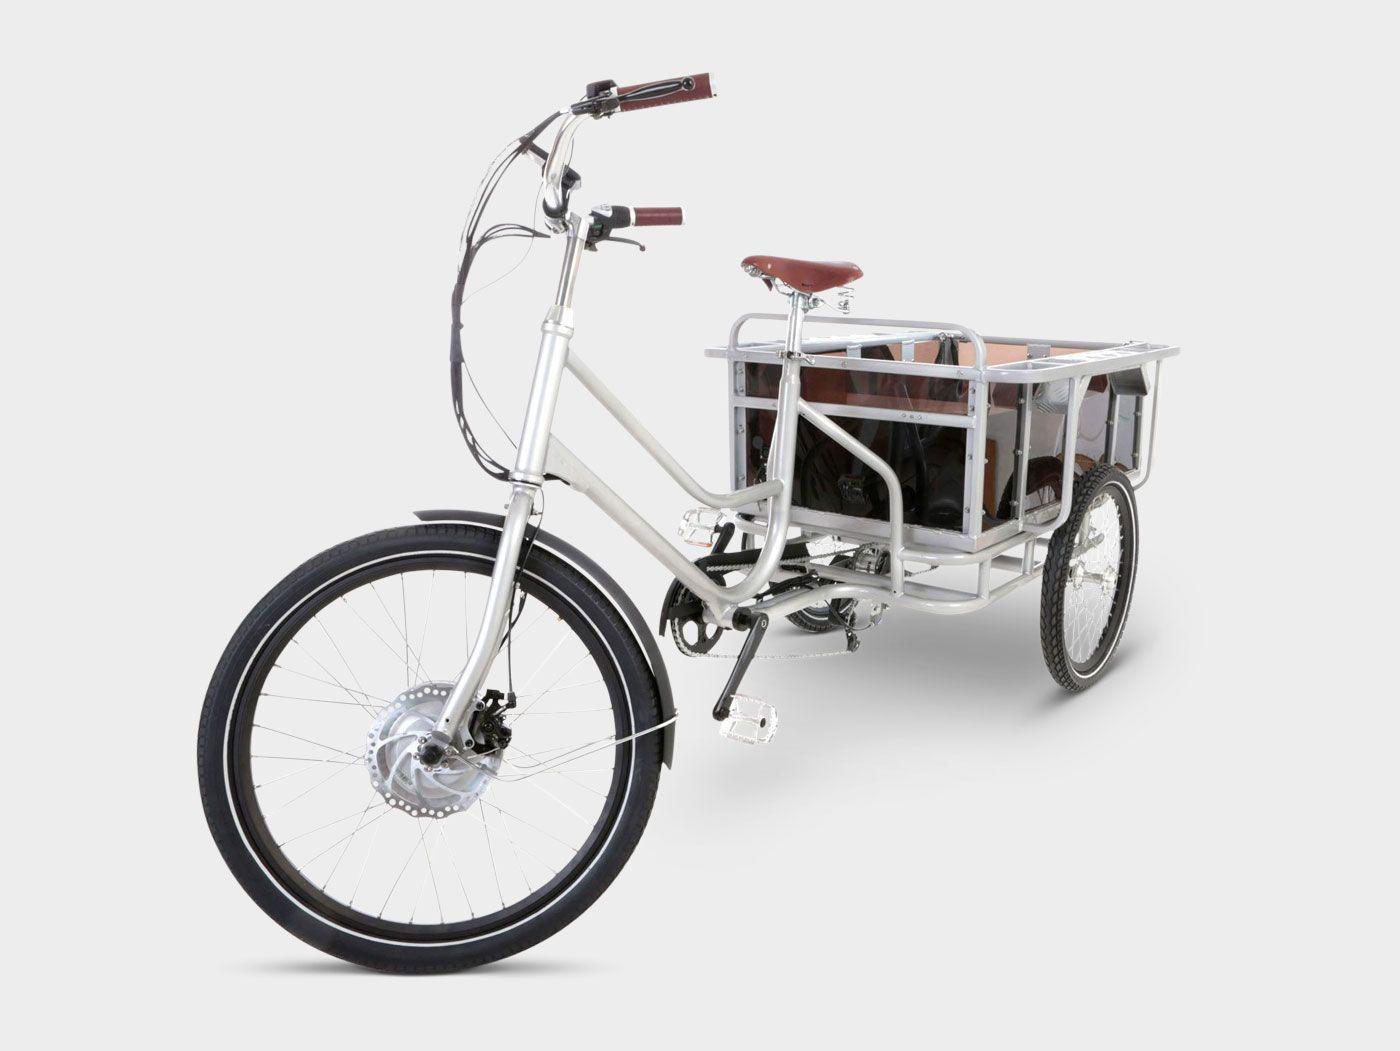 The Best Electric Cargo Bikes Cargo Bike Electric Cargo Bike Bike